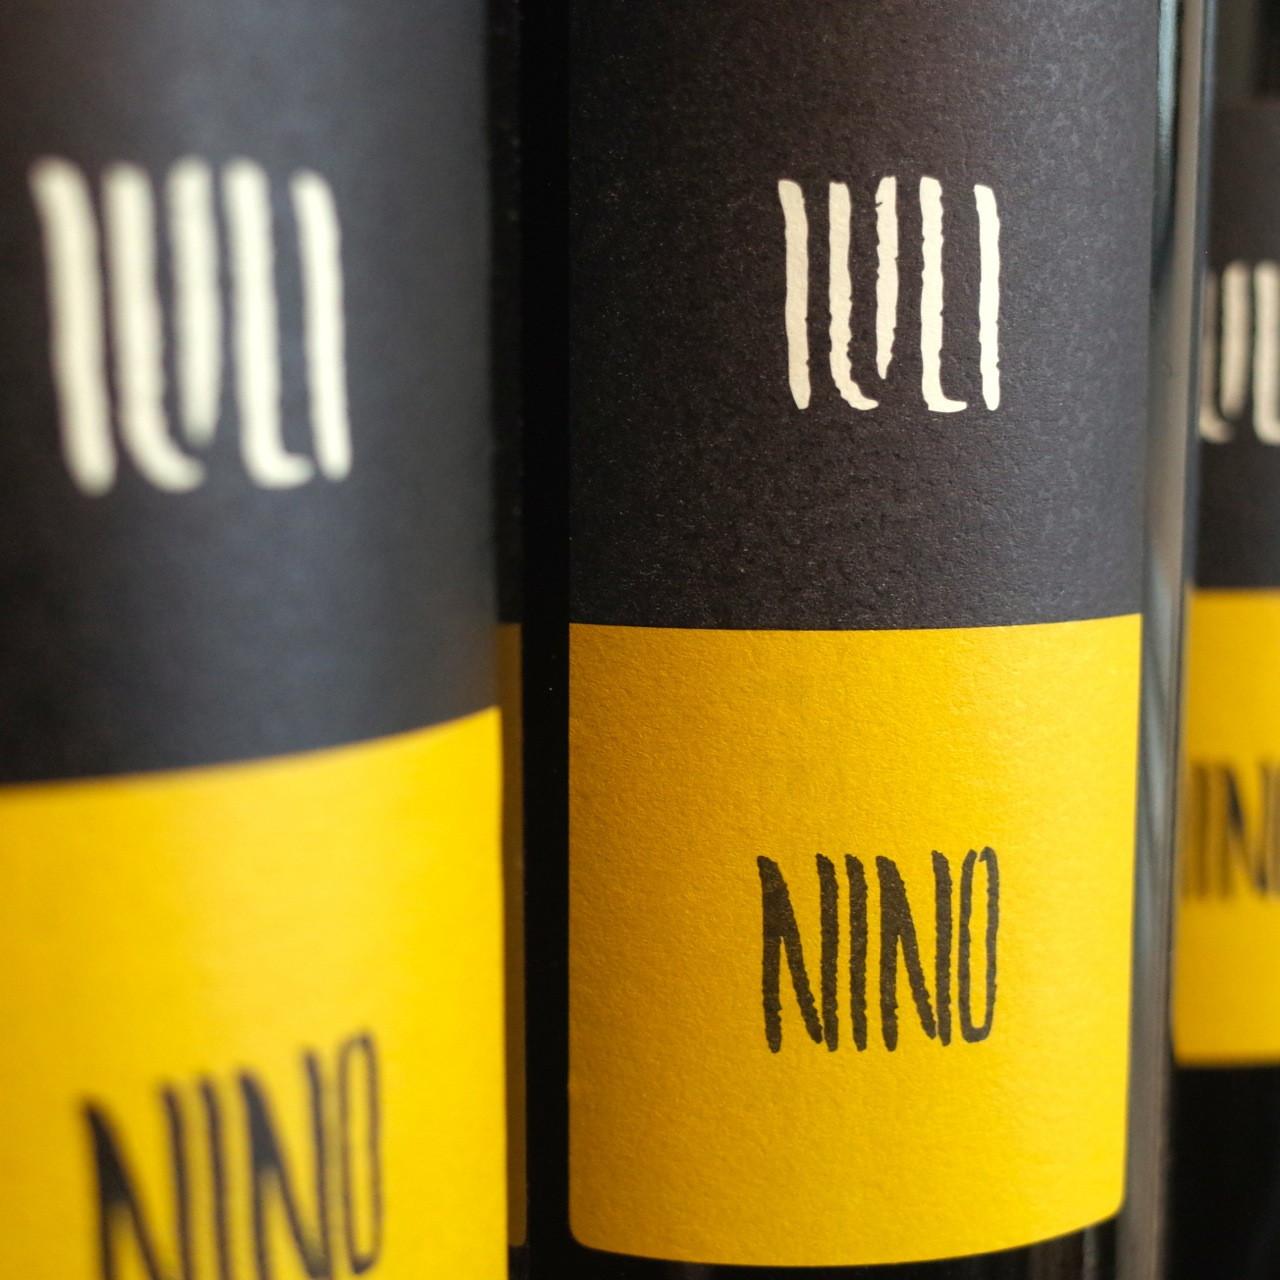 Iuli Nino - dieci vini da bere d'estate